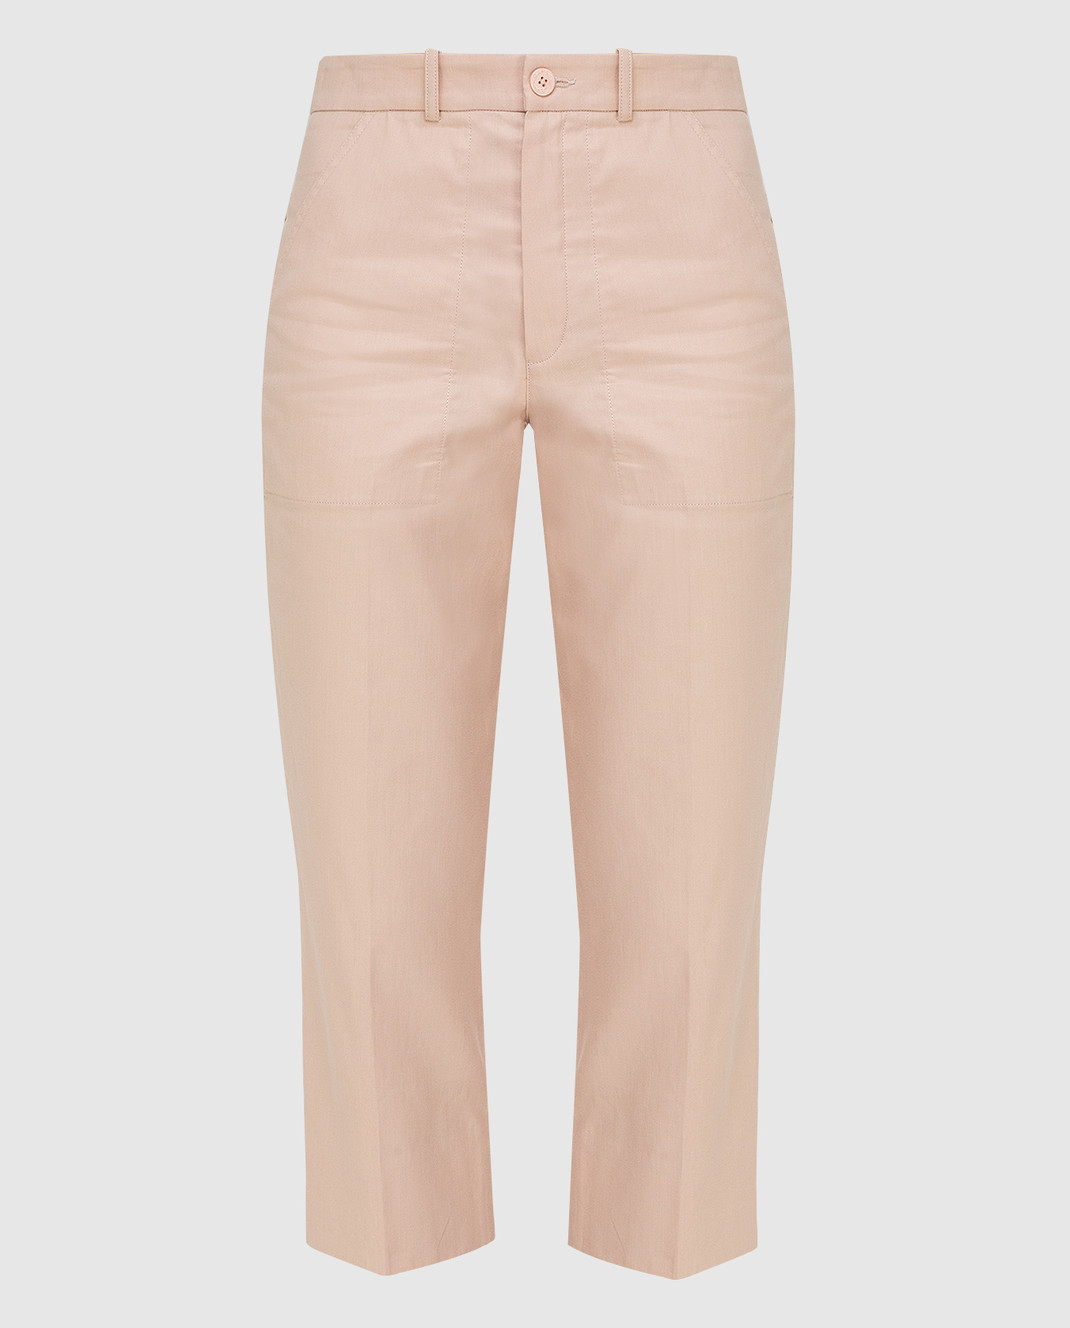 Chloe Светло-бежевые брюки 17EPA58